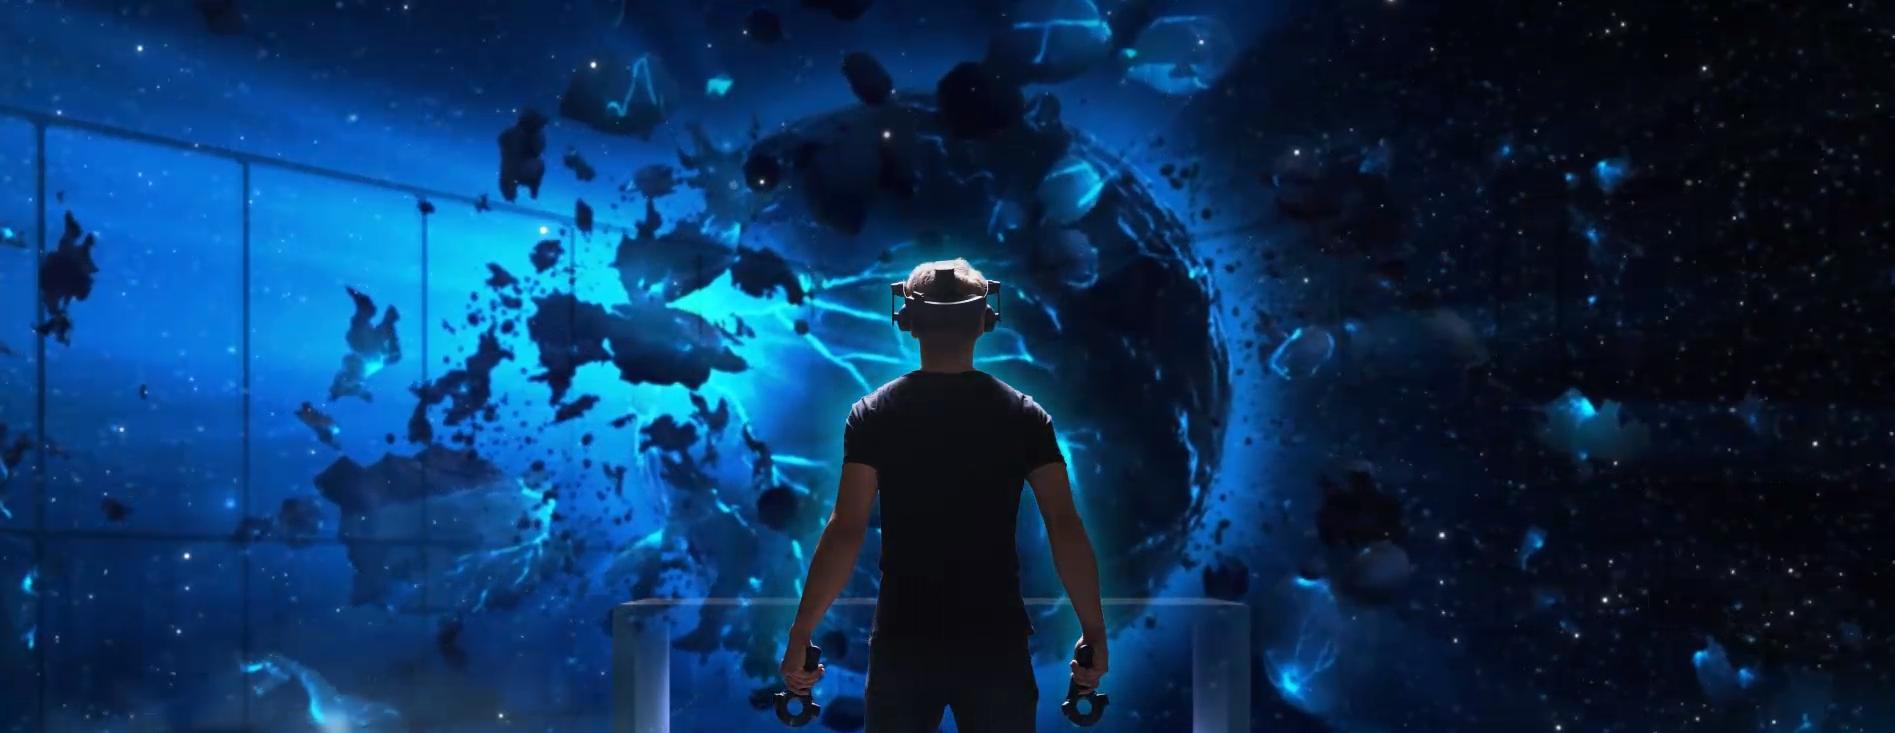 PC Gaming & VR